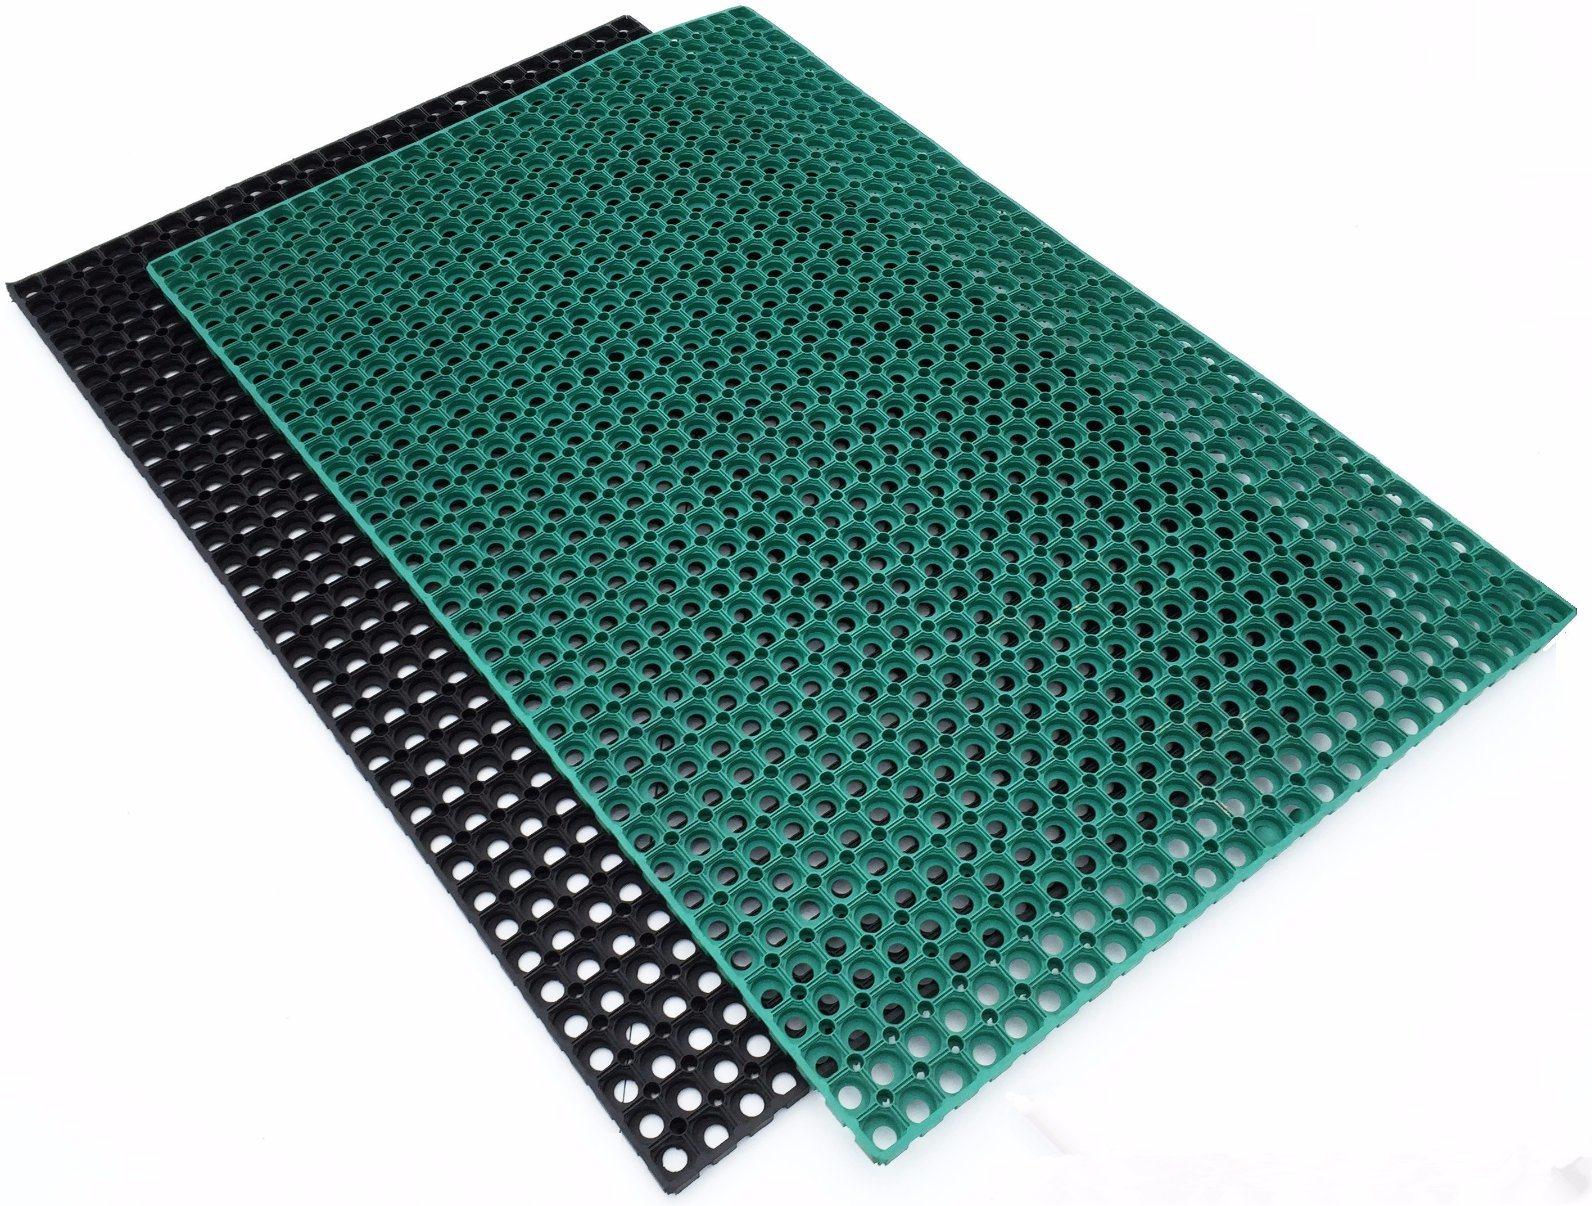 China Anti Slip Grass Drainage Rubber Mats/Ship Deck Rubber Flooring ...